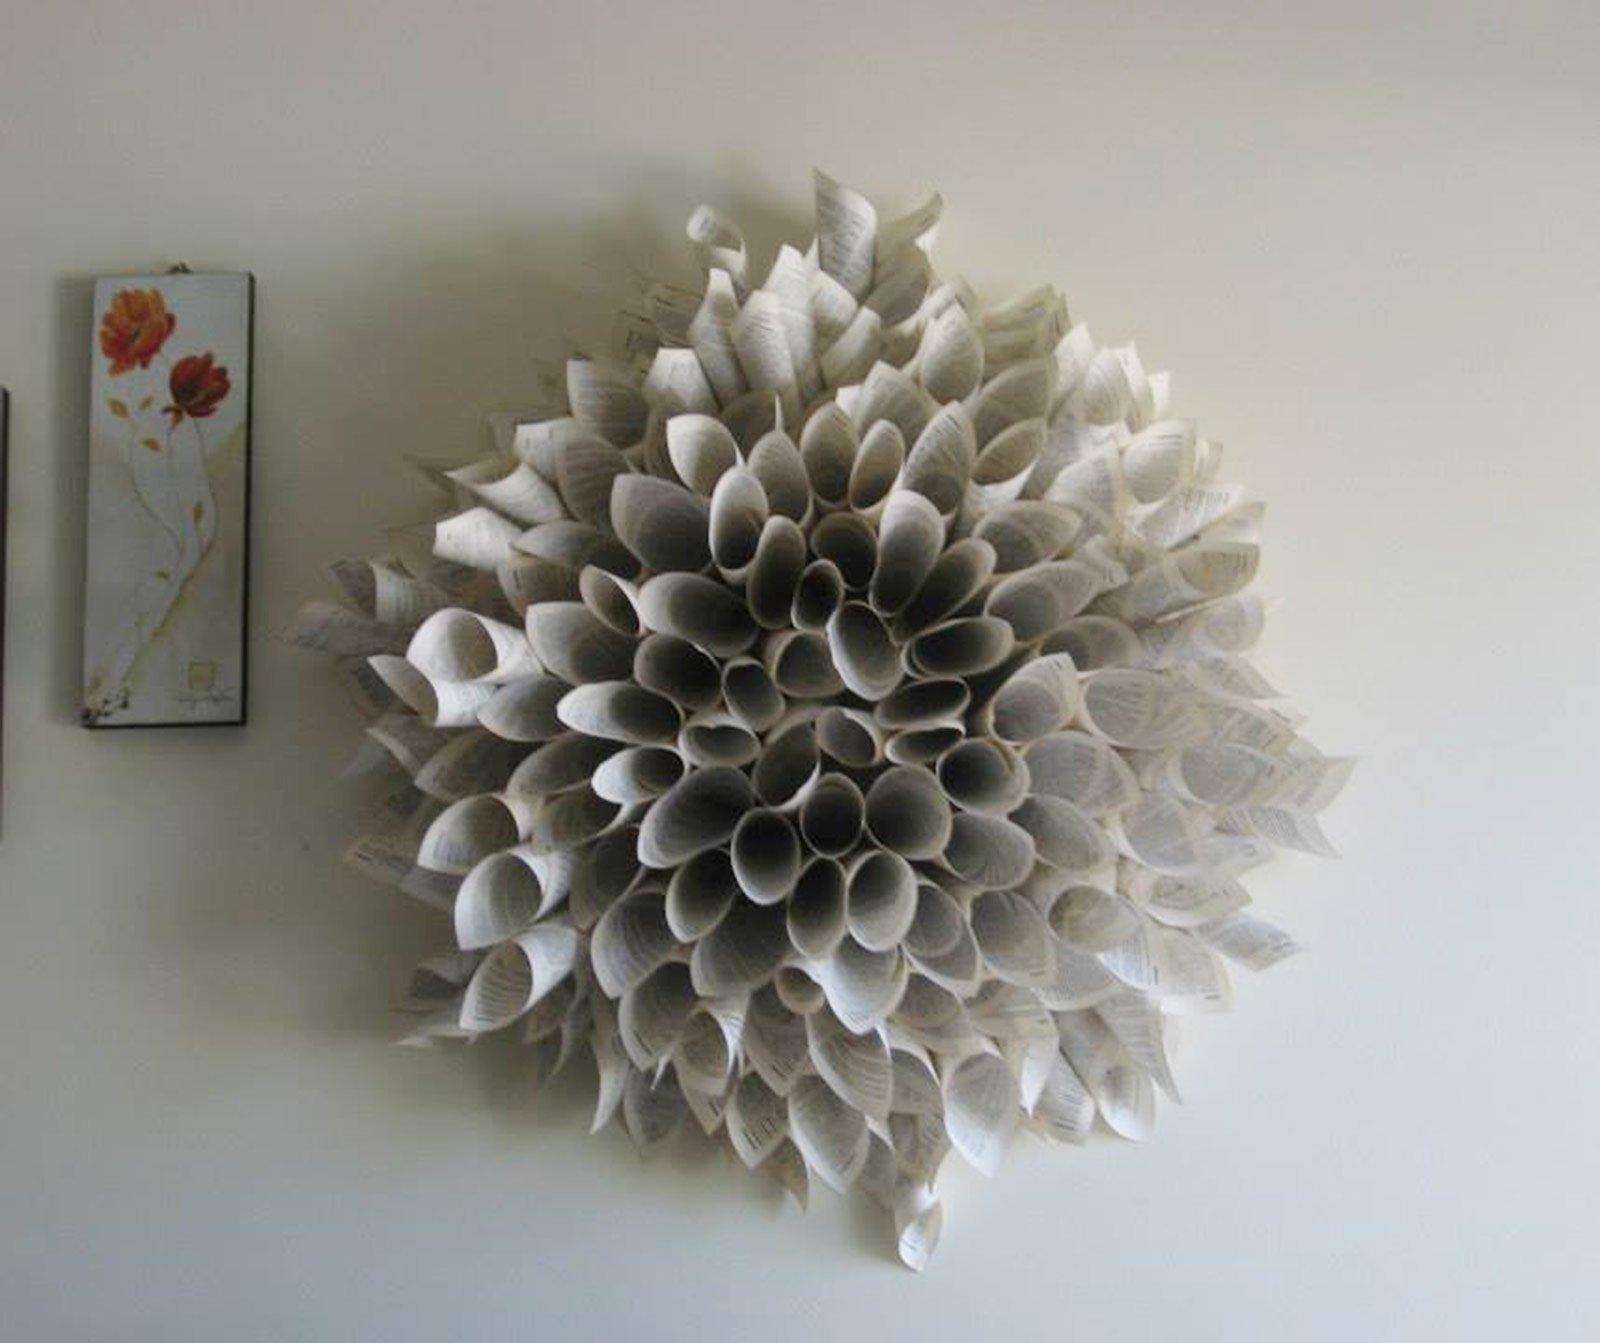 Ghirlanda di carta come cornice o decoro cose di casa for Ghirlande di carta